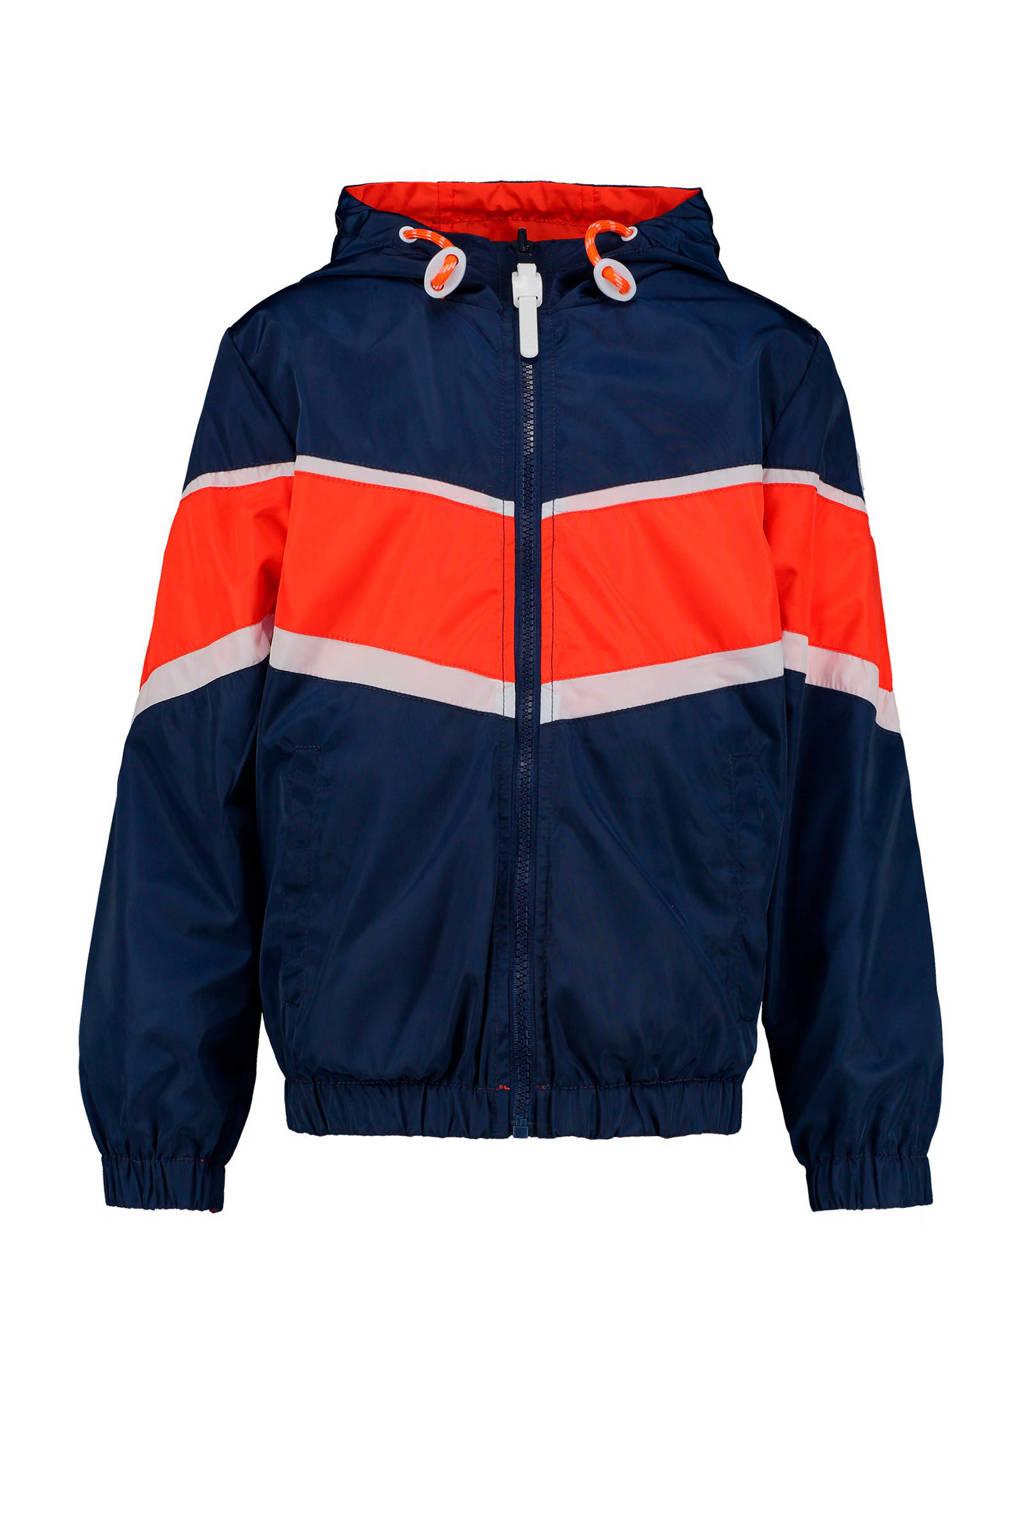 CKS KIDS zomerjas Borit donkerblauw/rood, Donkerblauw/rood